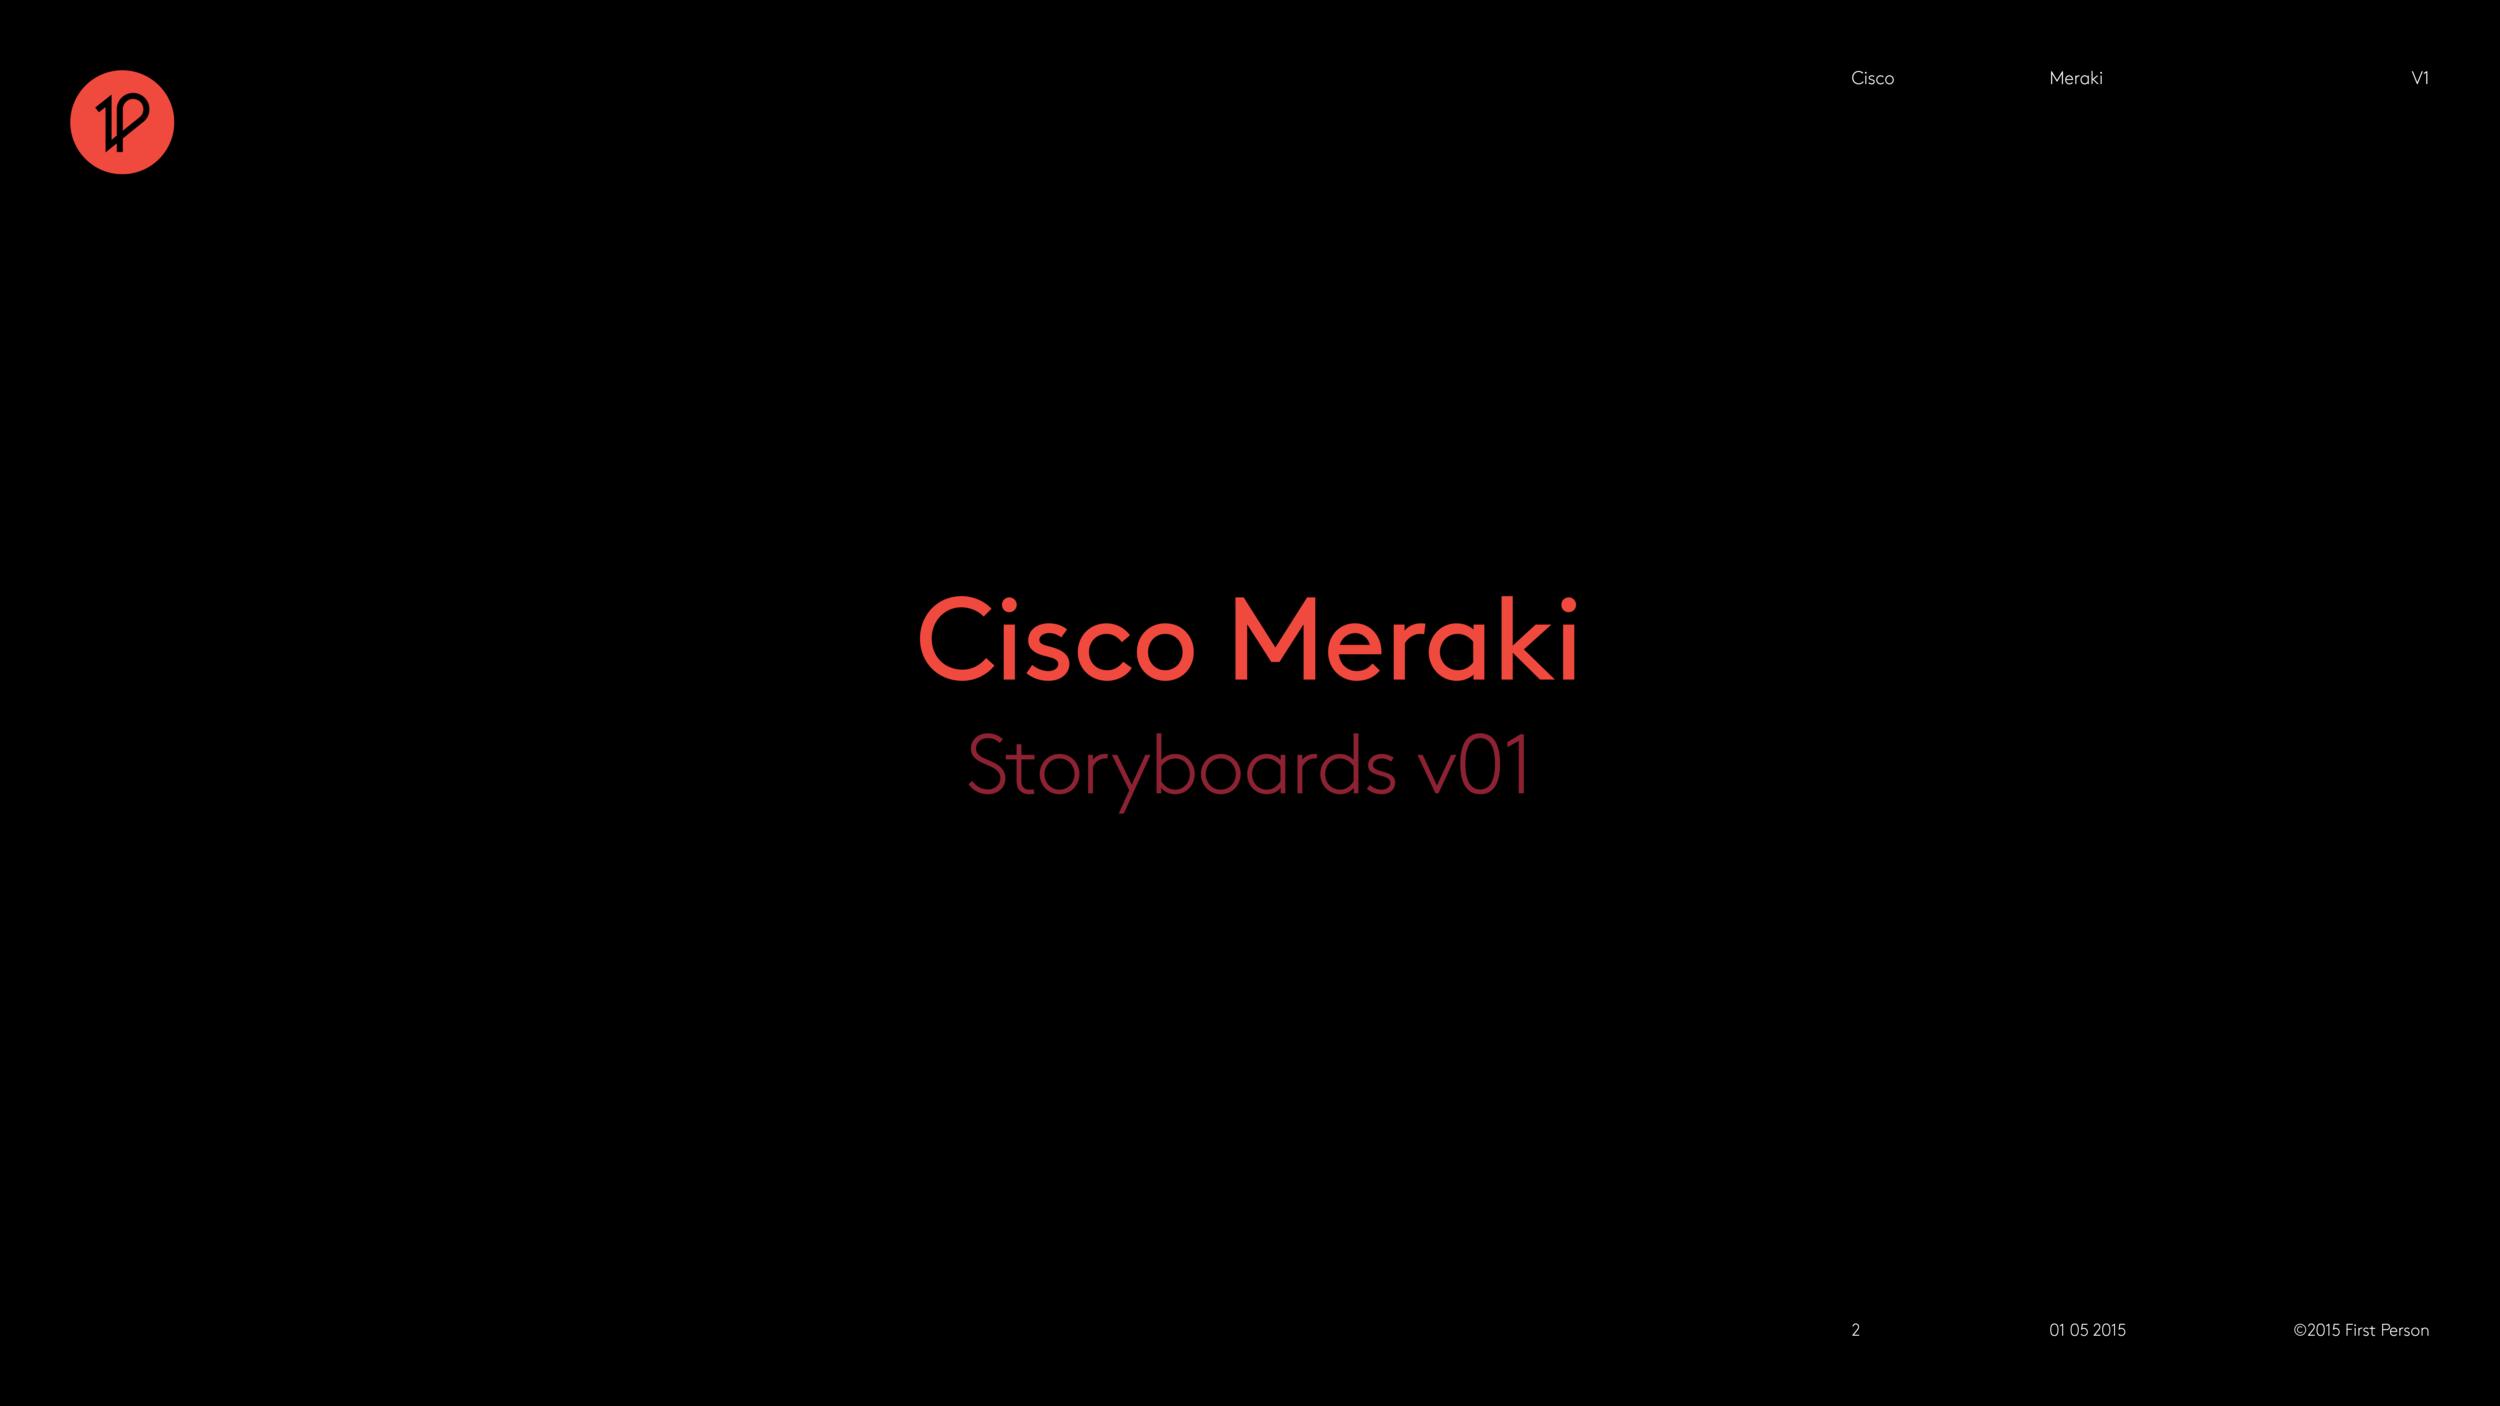 3431_CiscoMeraki_Storyboards_v01-2.png